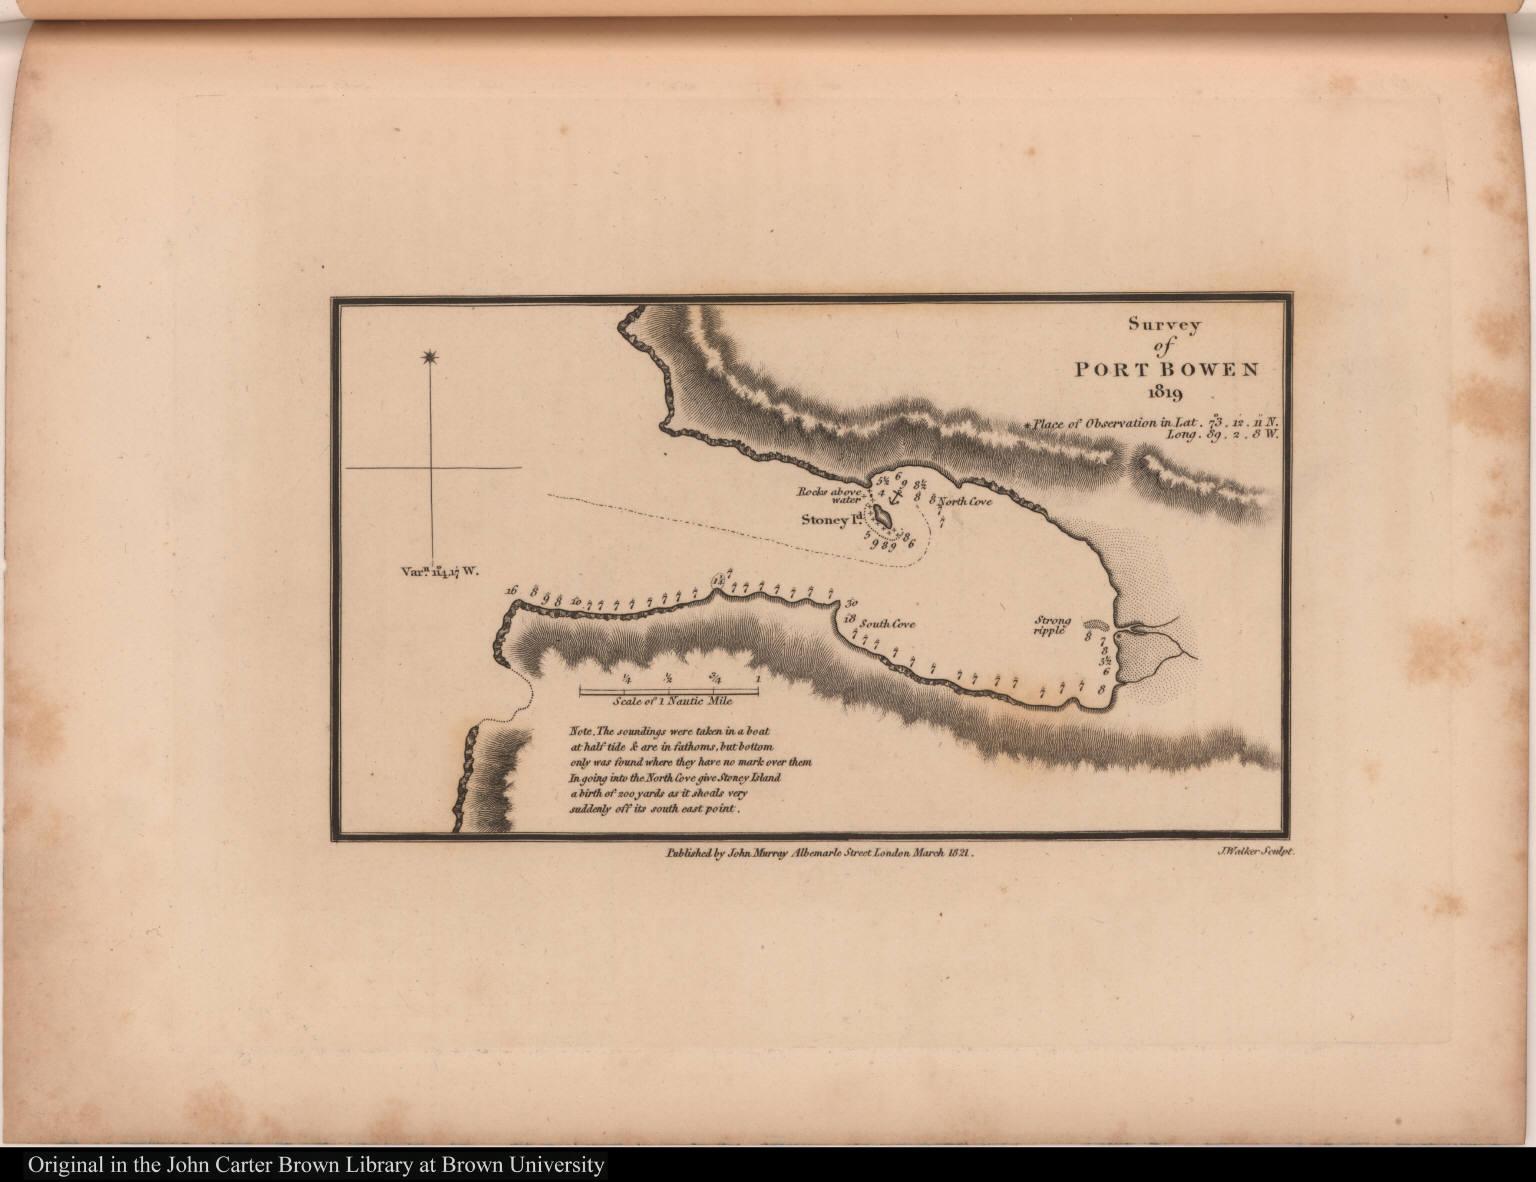 Survey of Port Bowen 1819